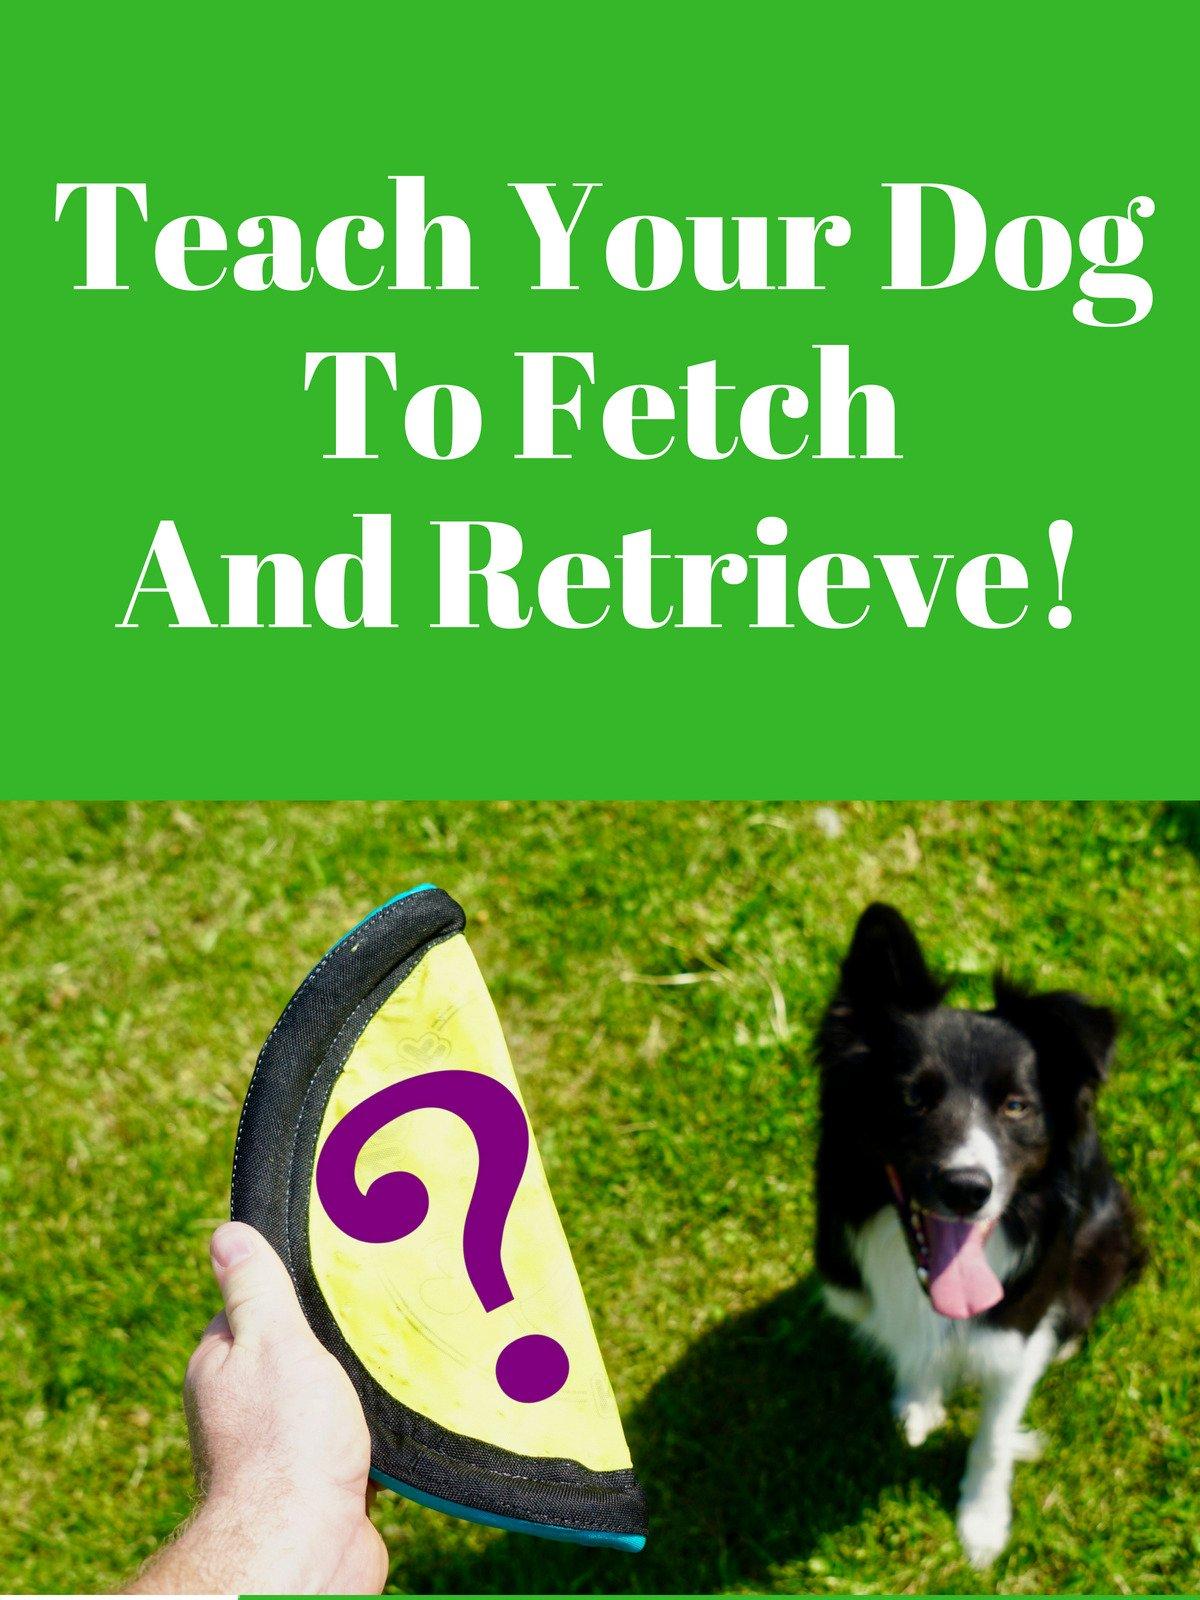 Teach Your Dog To Fetch And Retrieve